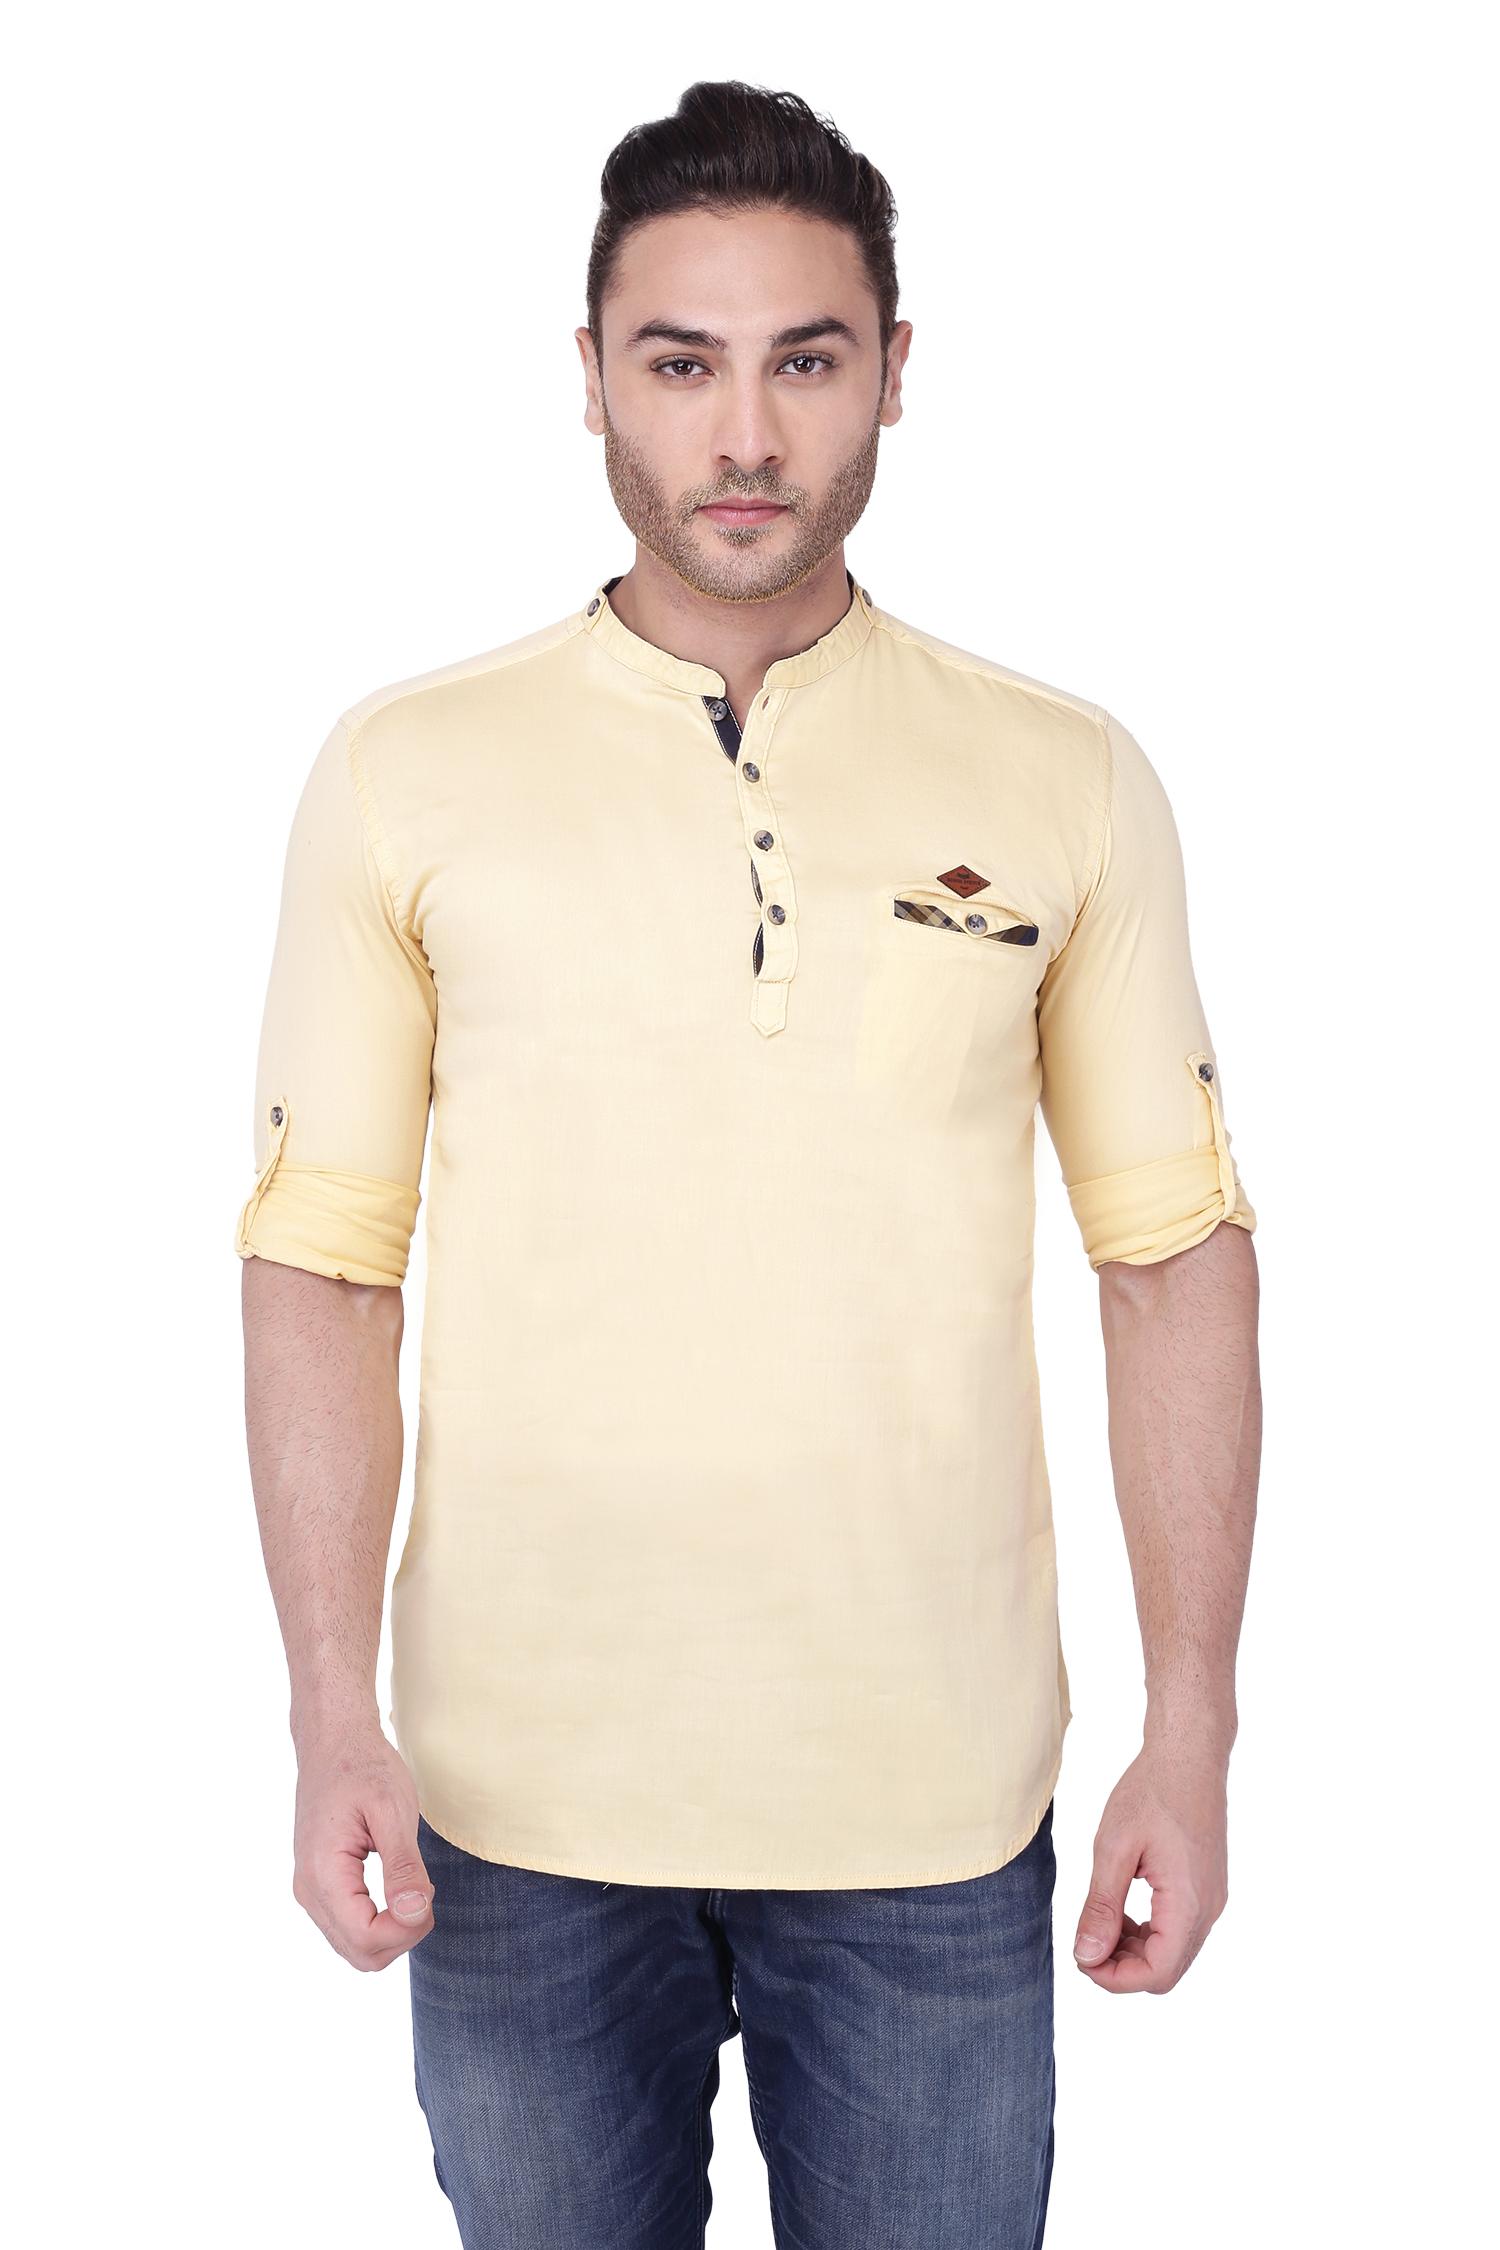 Kuons Avenue | Kuons Avenue Men's Cream Yellow Casual Cotton Kurta- KACLFS1260CYL